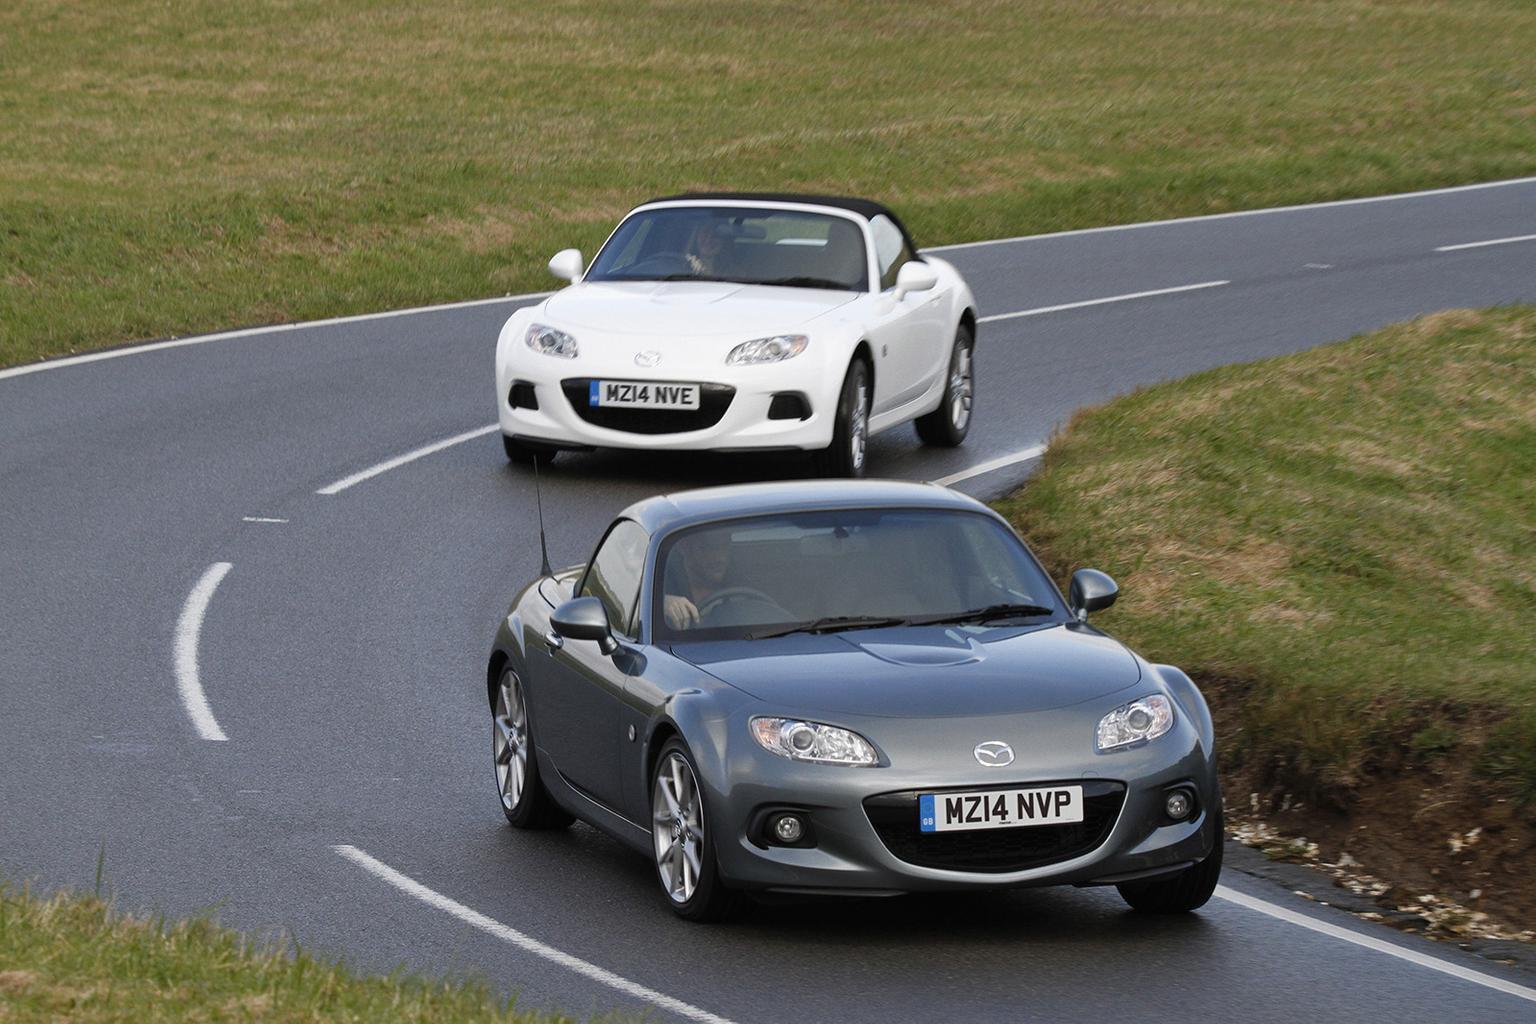 New Mazda MX-5 gets radical look